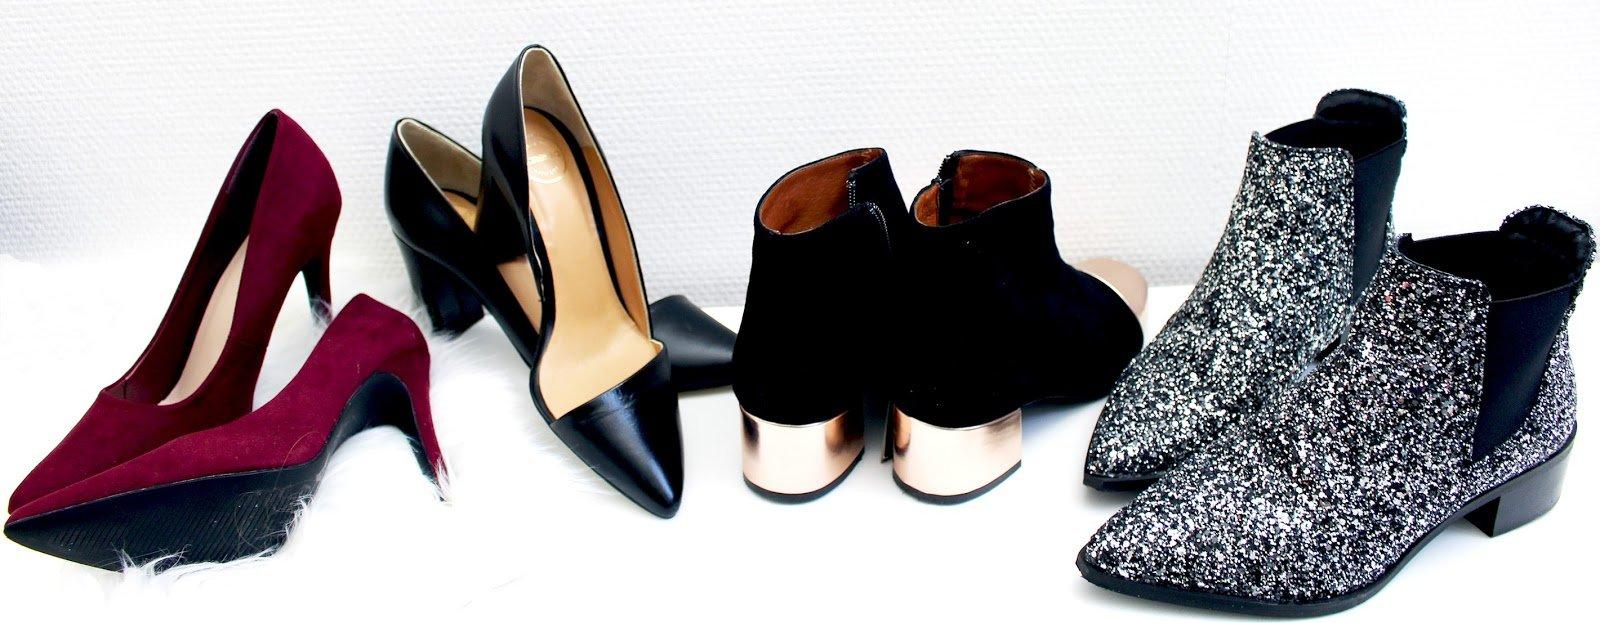 chaussures de soirée blog mode